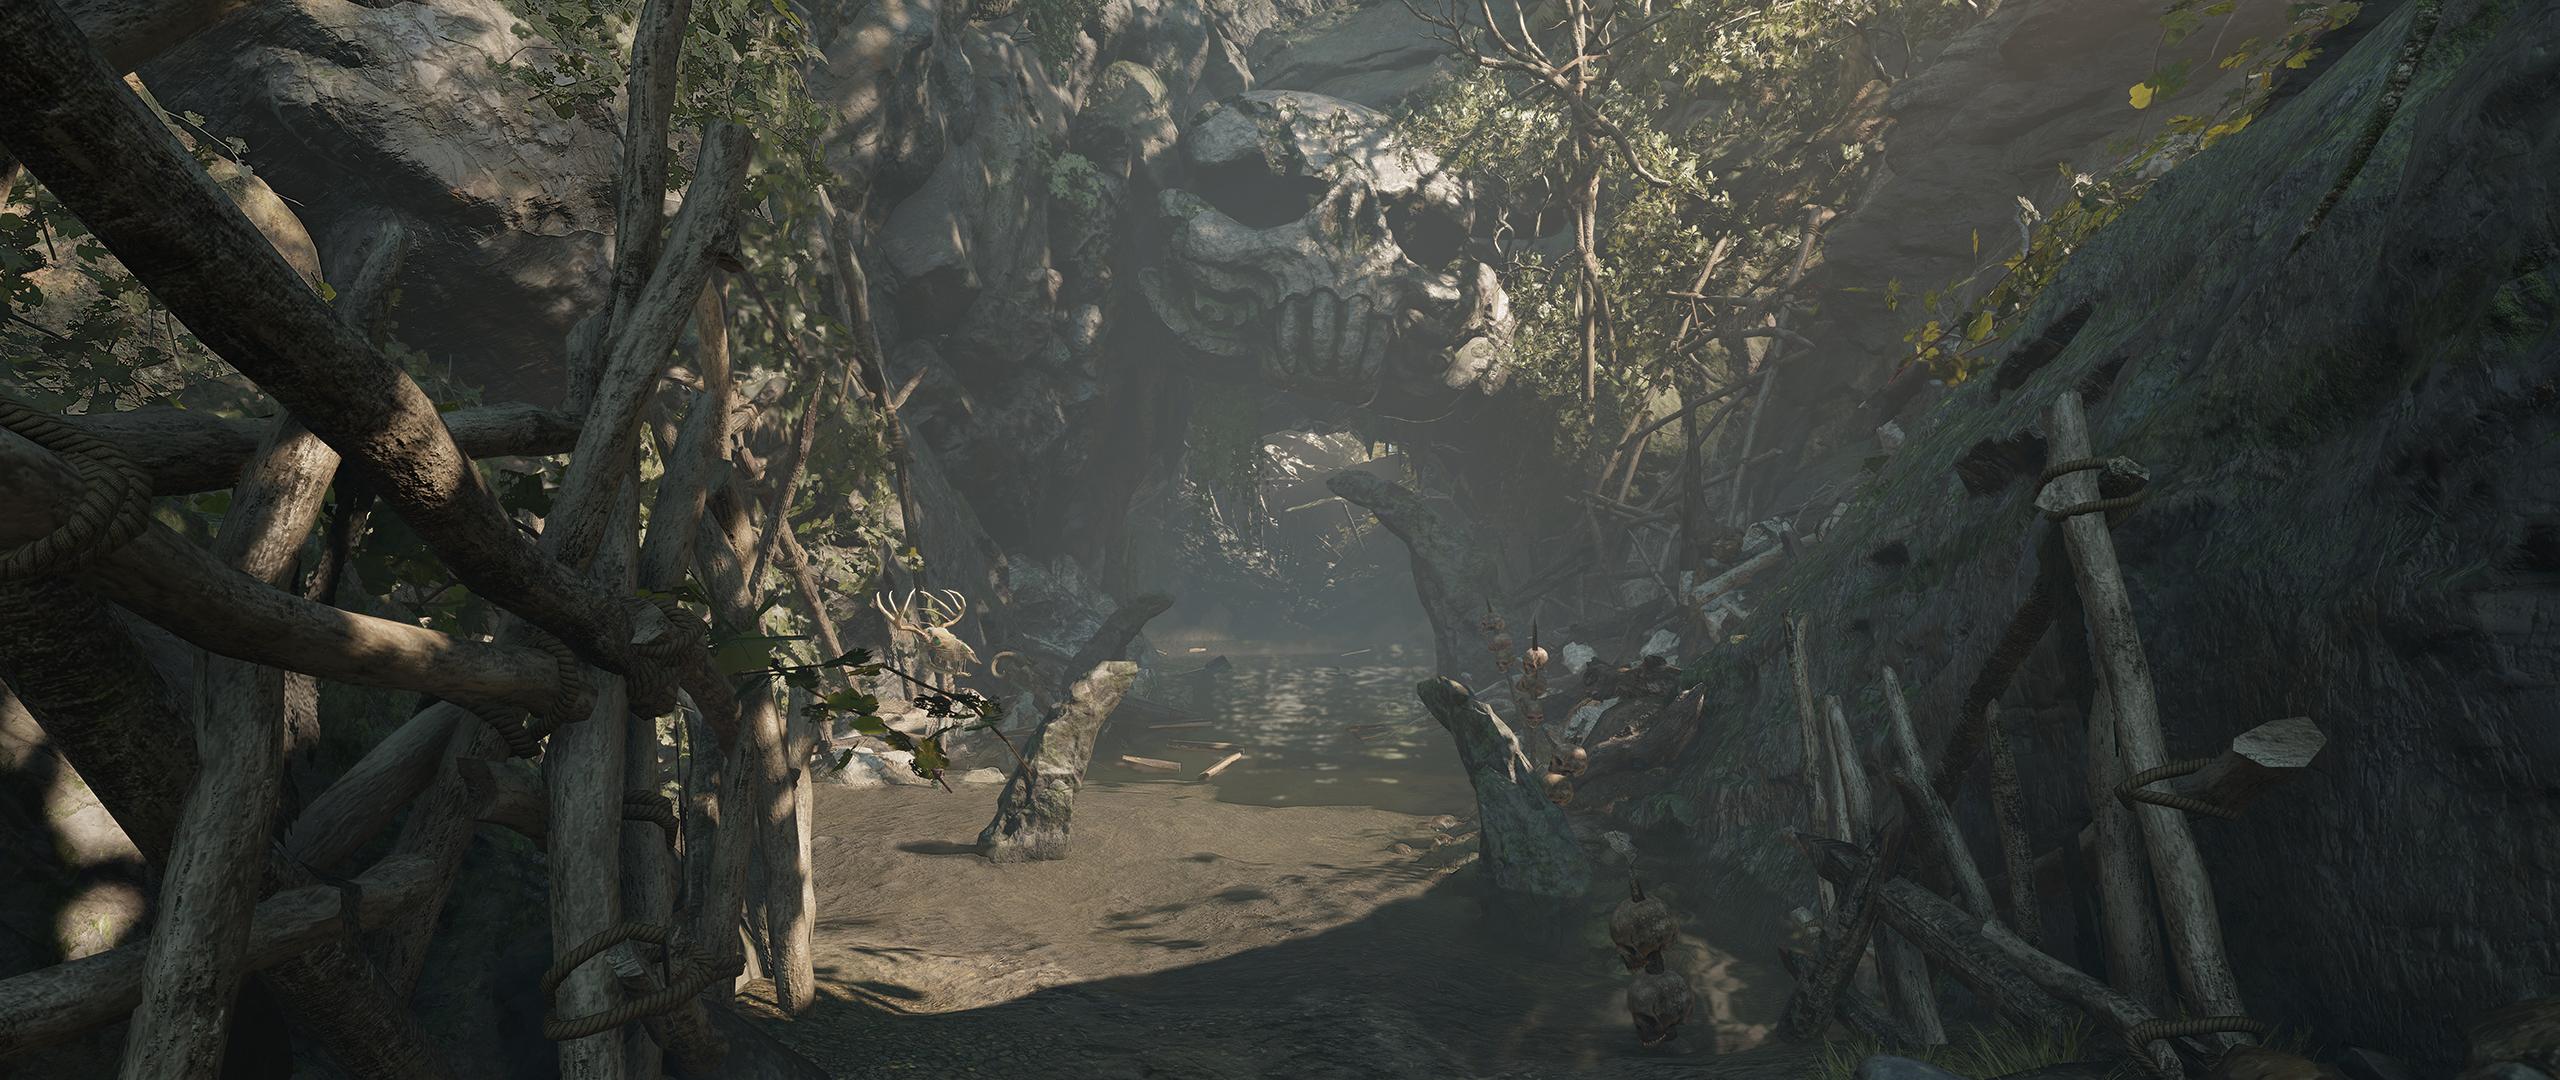 Shadow of the Tomb Raider Super-Resolution 2018.11.22 - 14.47.36.07.jpg - Shadow of the Tomb Raider